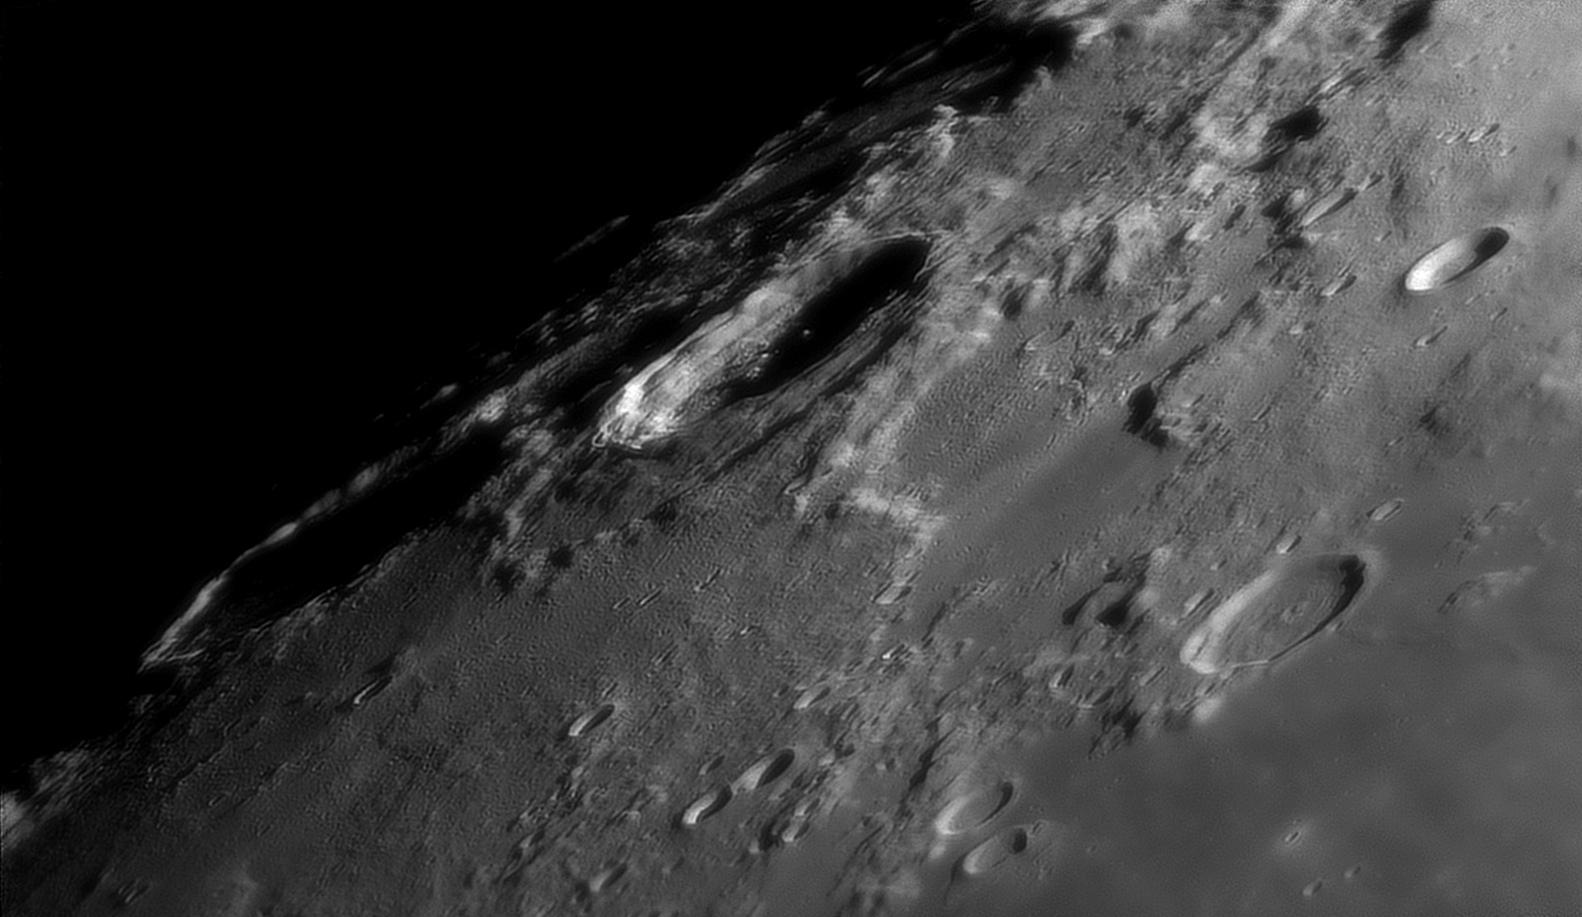 large.2021-02-23-2059_Moon_R80-FI.jpg.65f36c1cbc866f05abe967c000388e86.jpg